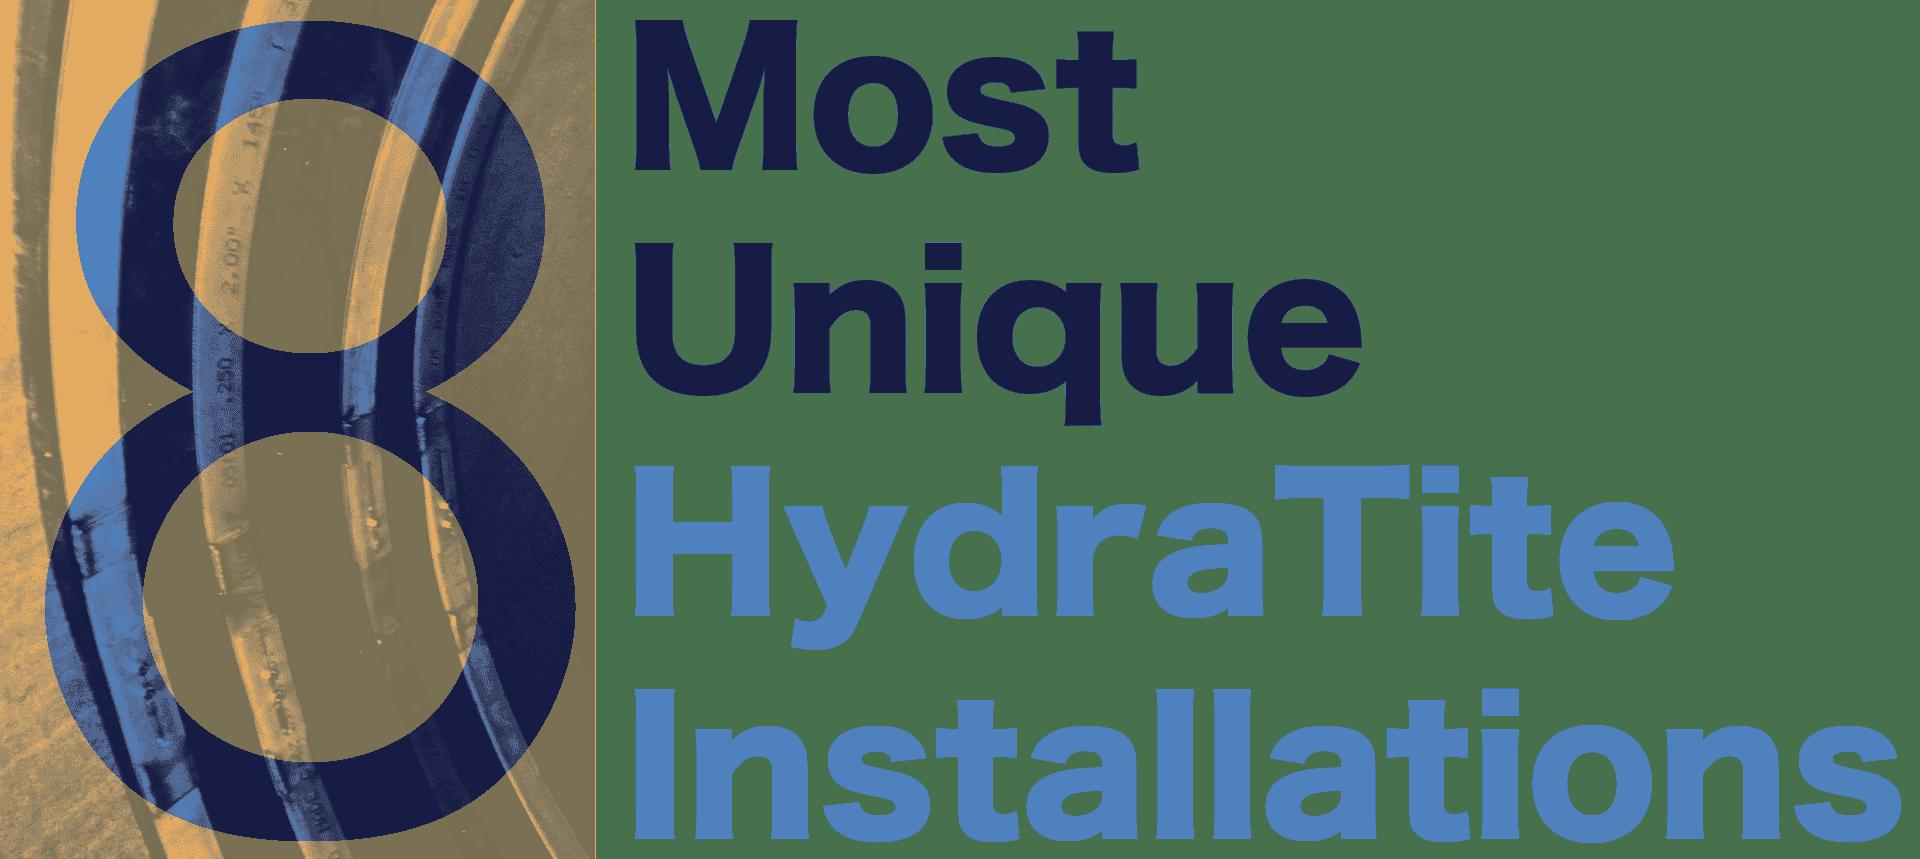 '8 Most Unique HydraTech Installation'